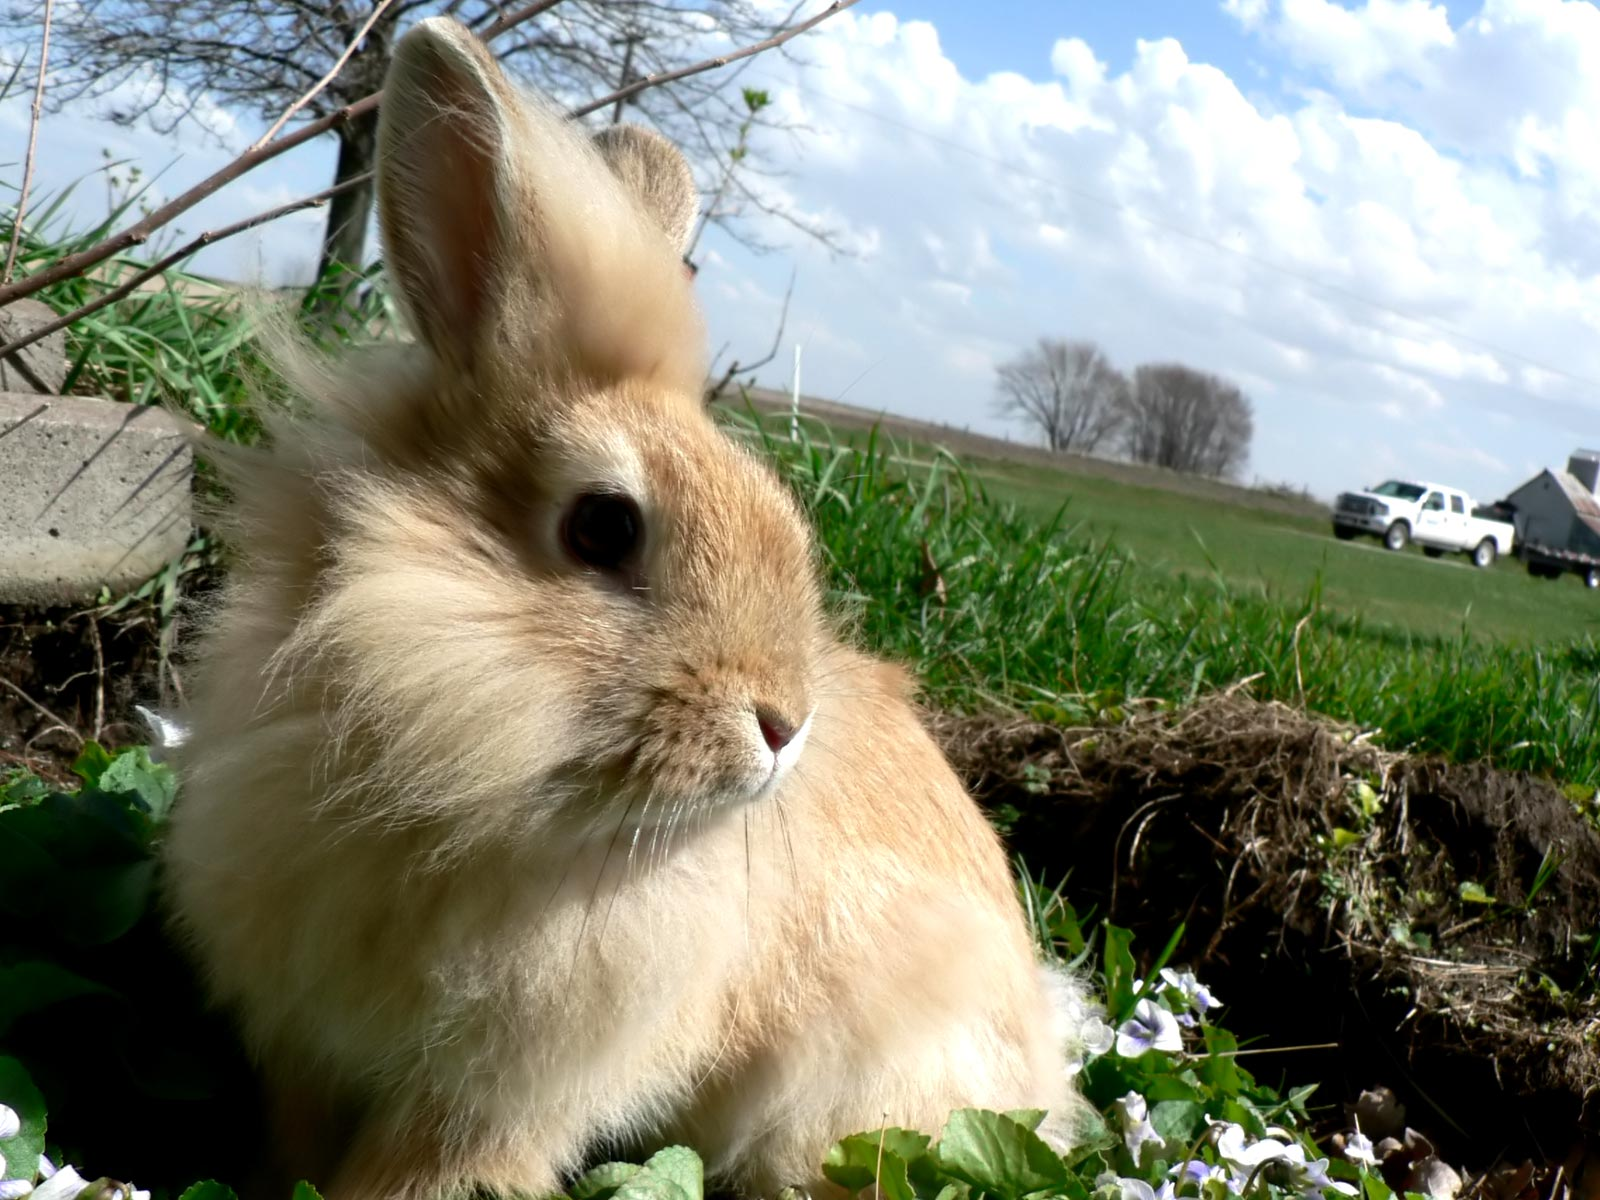 http://1.bp.blogspot.com/-rRsLh2f8gvc/T9xCywQ_1lI/AAAAAAAACVg/5_O_OYAZWnY/s1600/Rabbit+Picture.jpeg